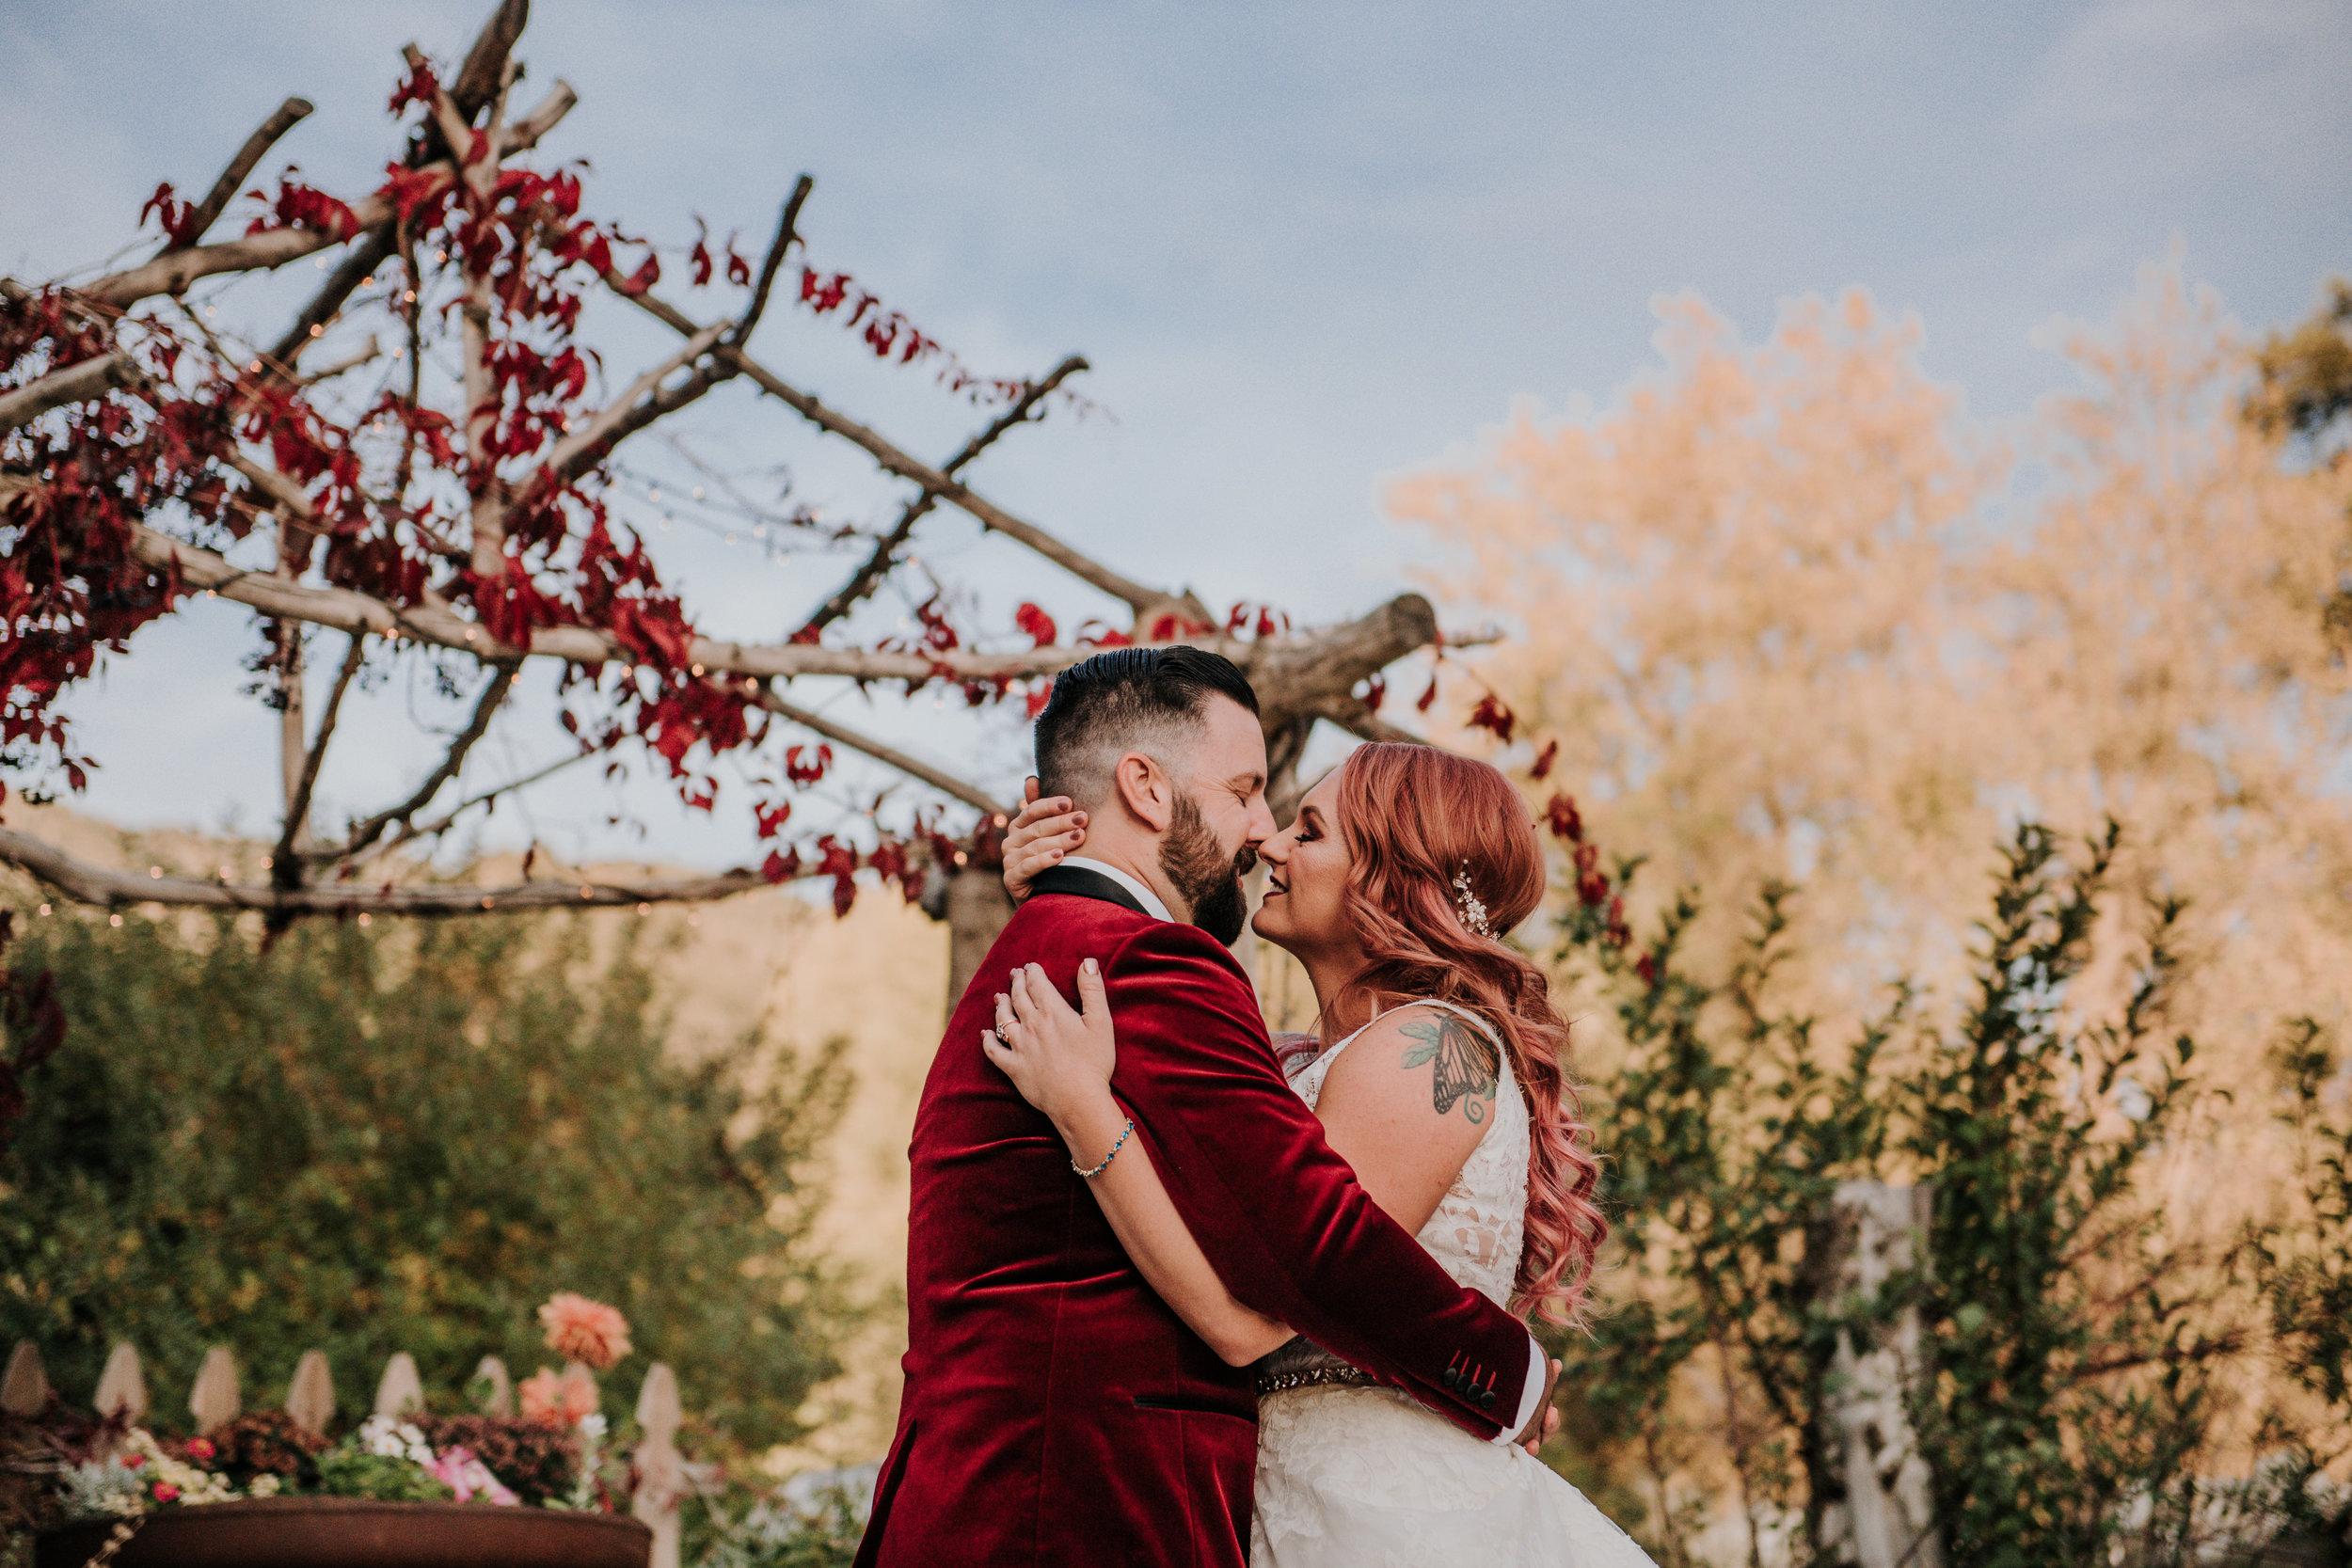 2018-11-04 Maresa and Nick - Married - Oak Glen-1119.jpg